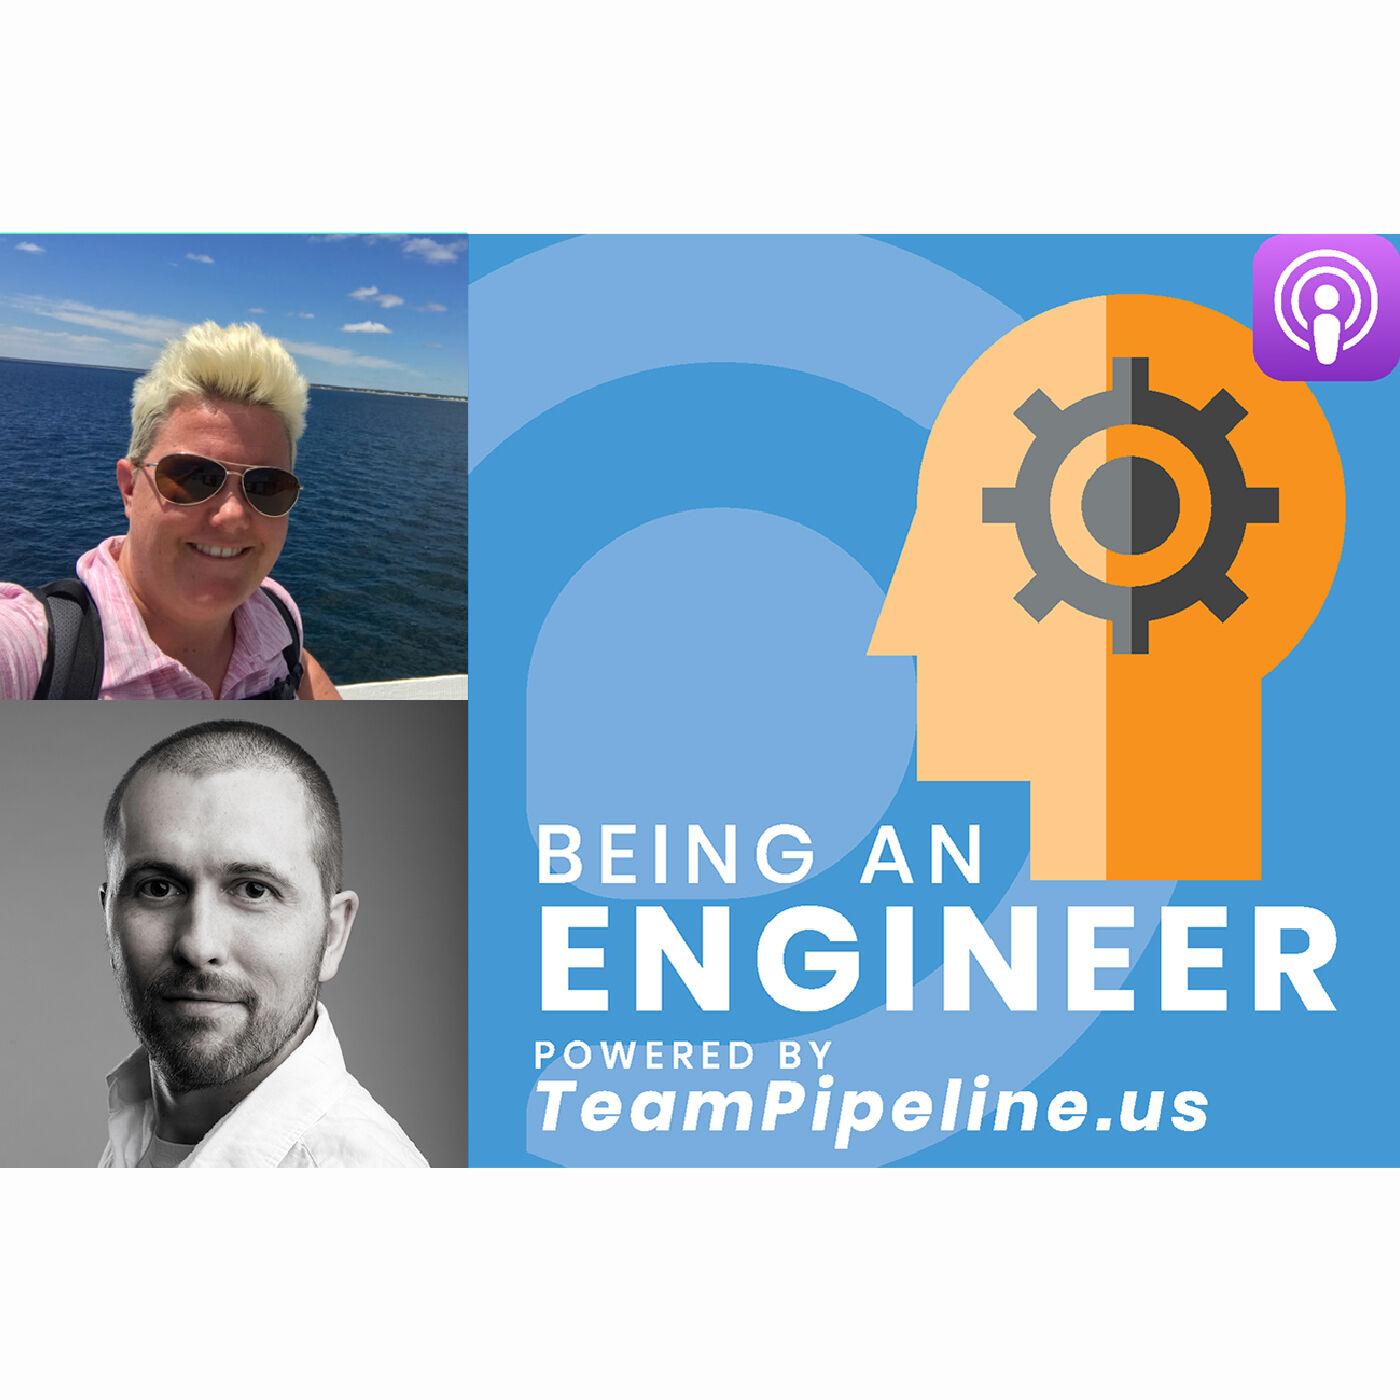 S2E05 Why W.L. Gore is An Amazing Engineering (& People) Company – Elizabeth Mallett